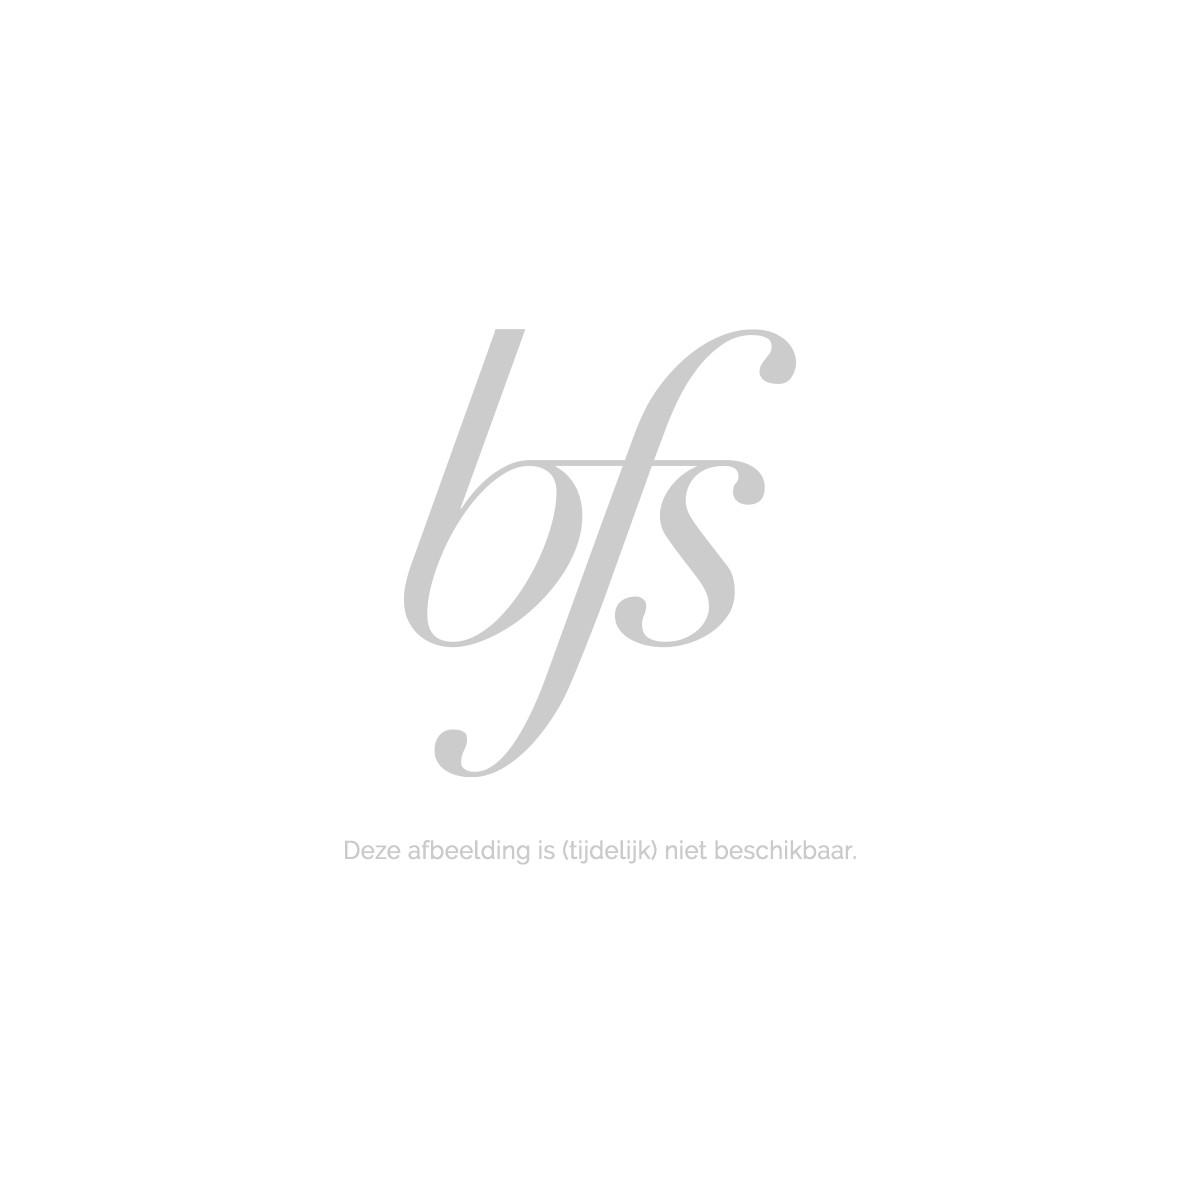 Afbeelding van Dermalogica Biolumin C Serum Concentraat Beauty